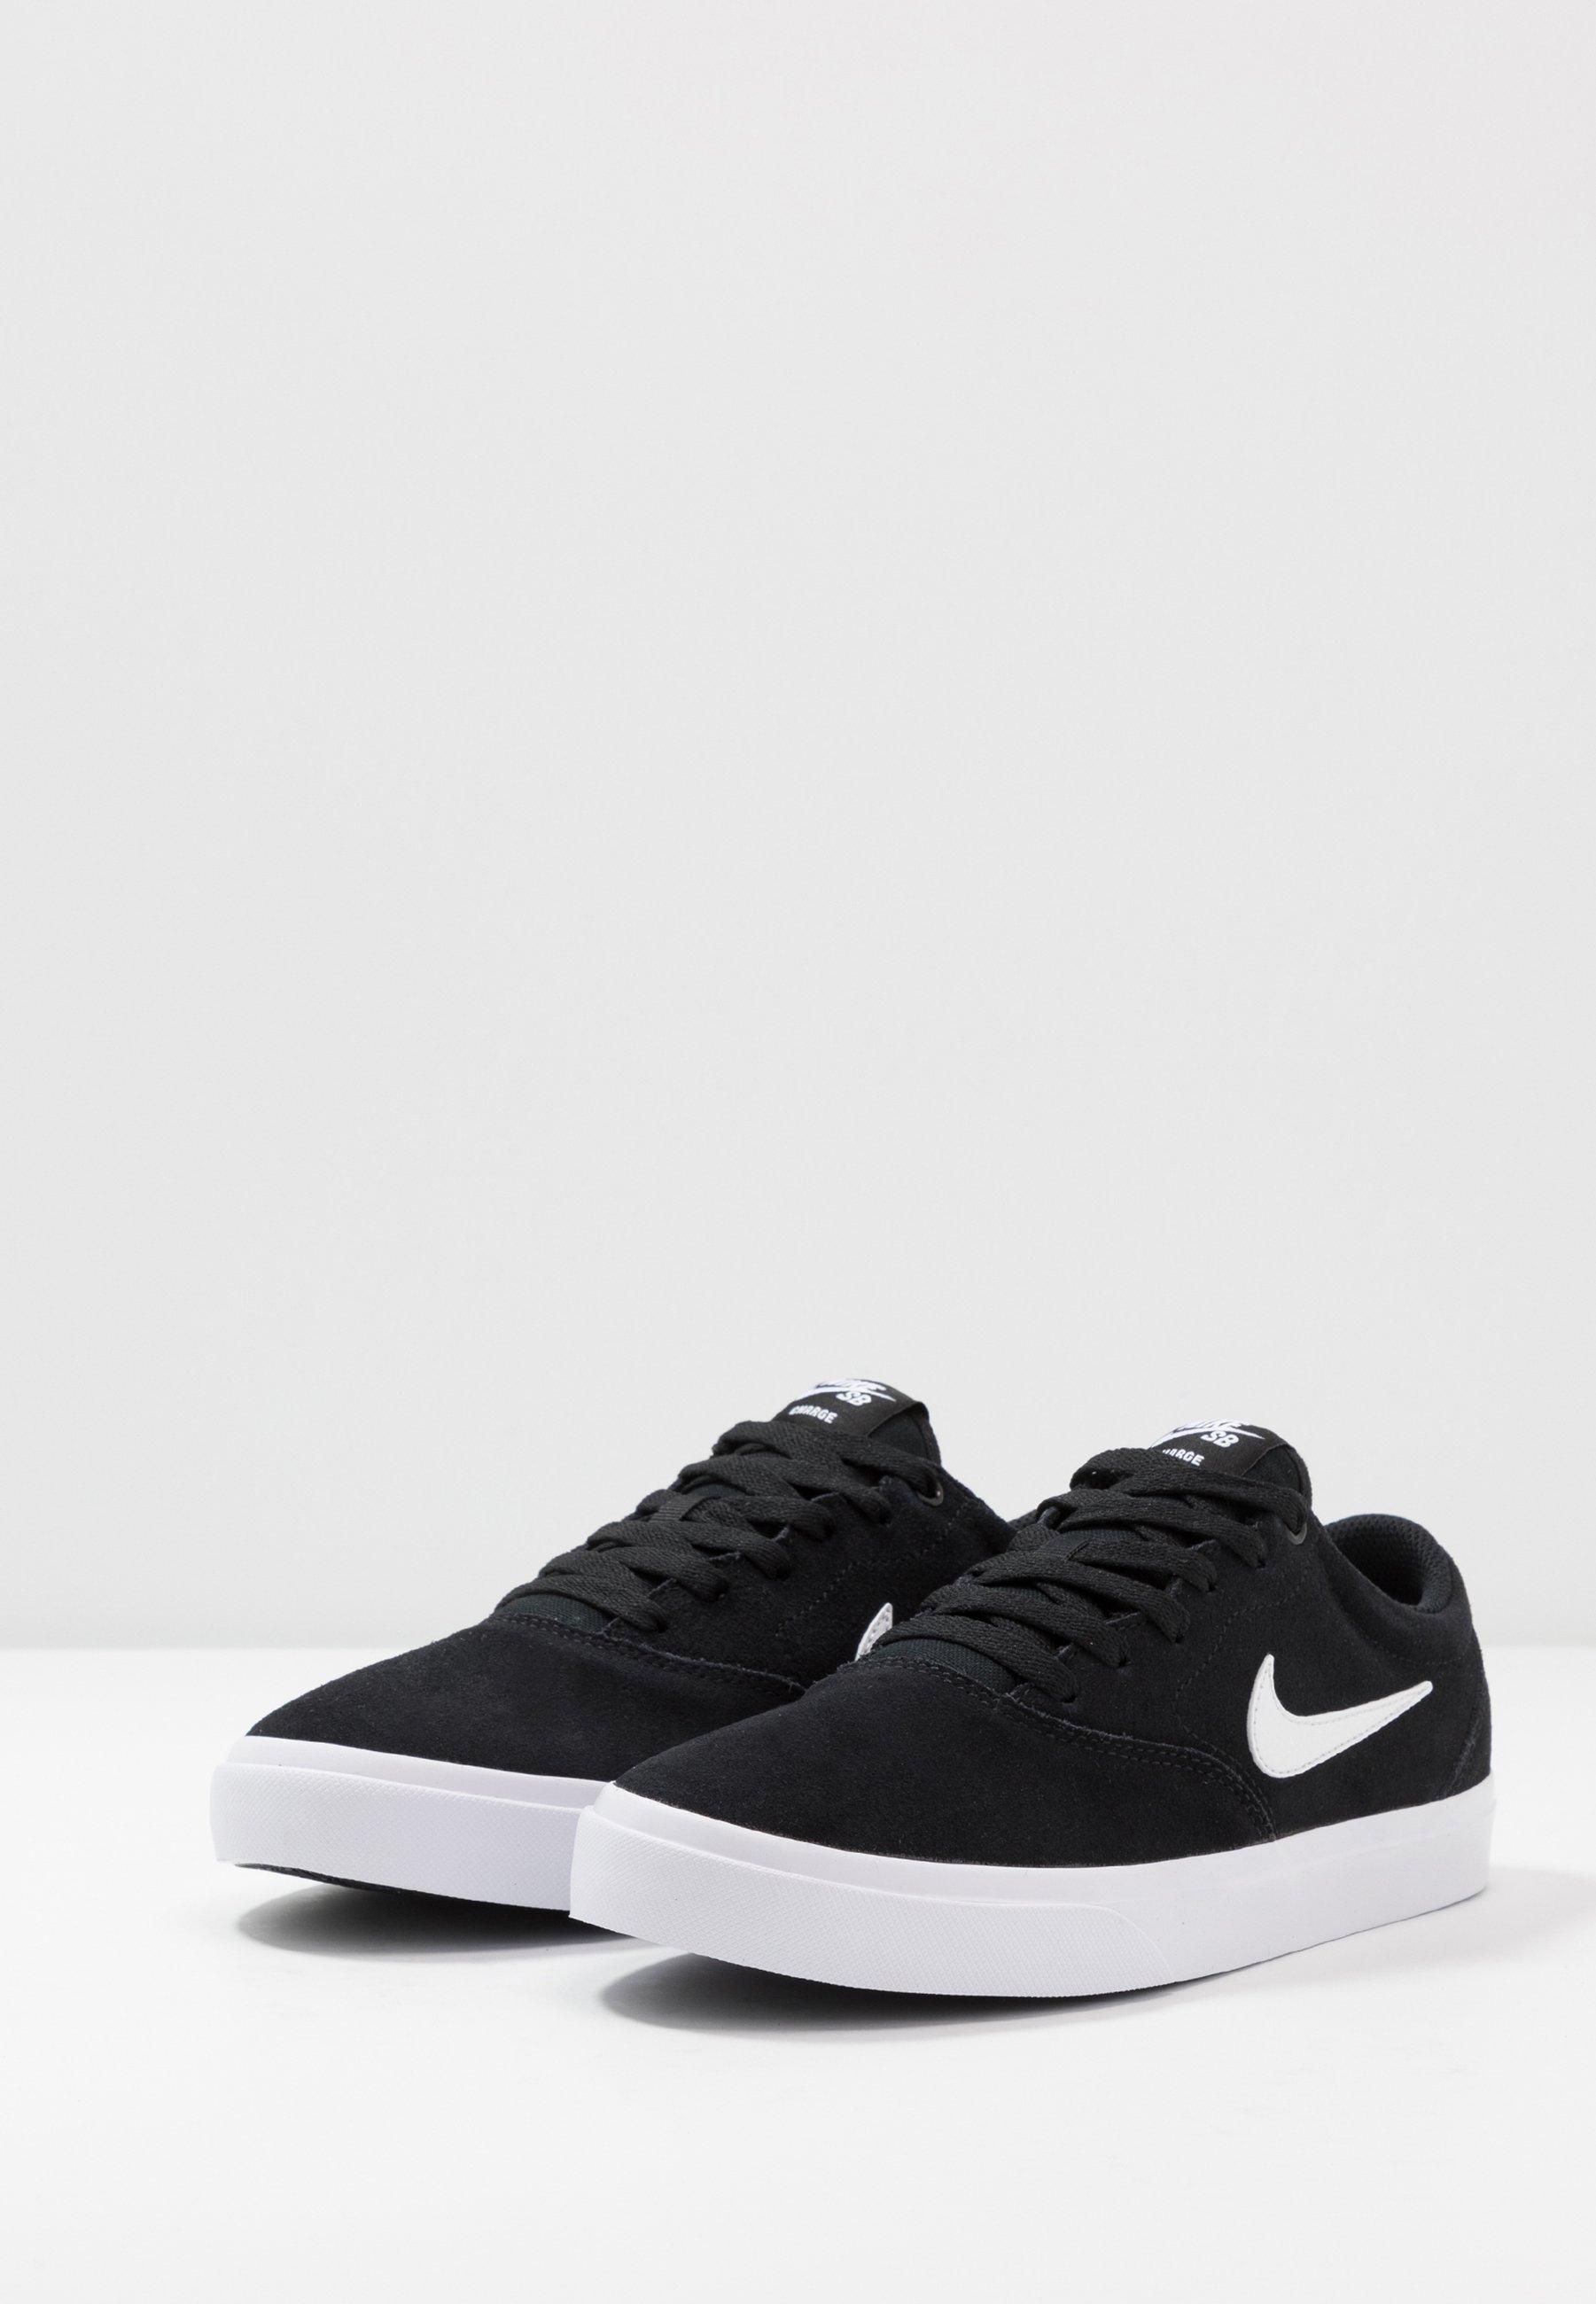 Nike SB CHARGE - Chaussures de skate - black/white/noir - ZALANDO.FR